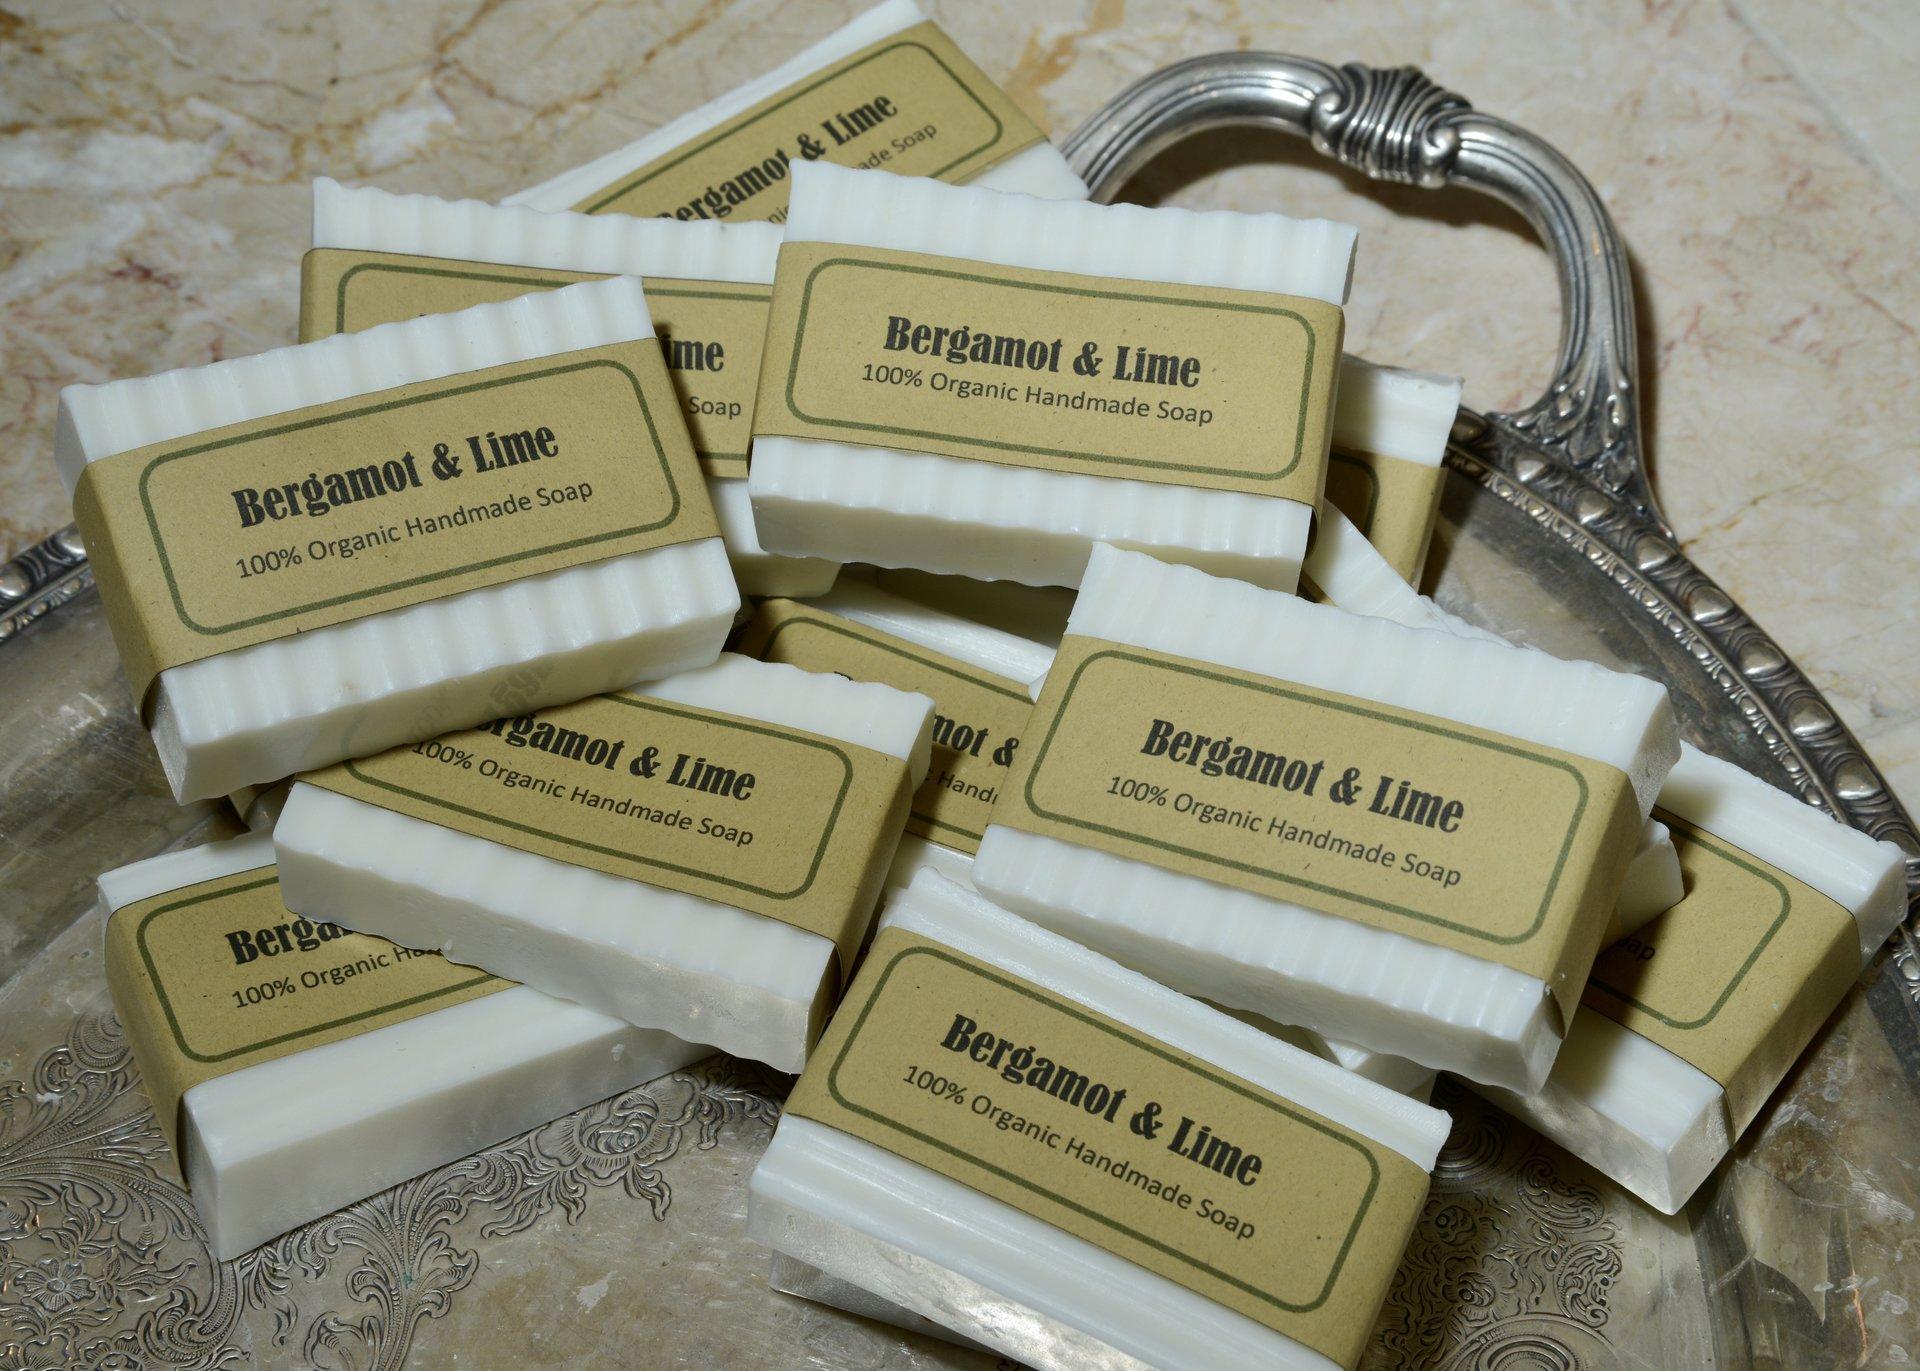 Bergamot lime 100% organic soap